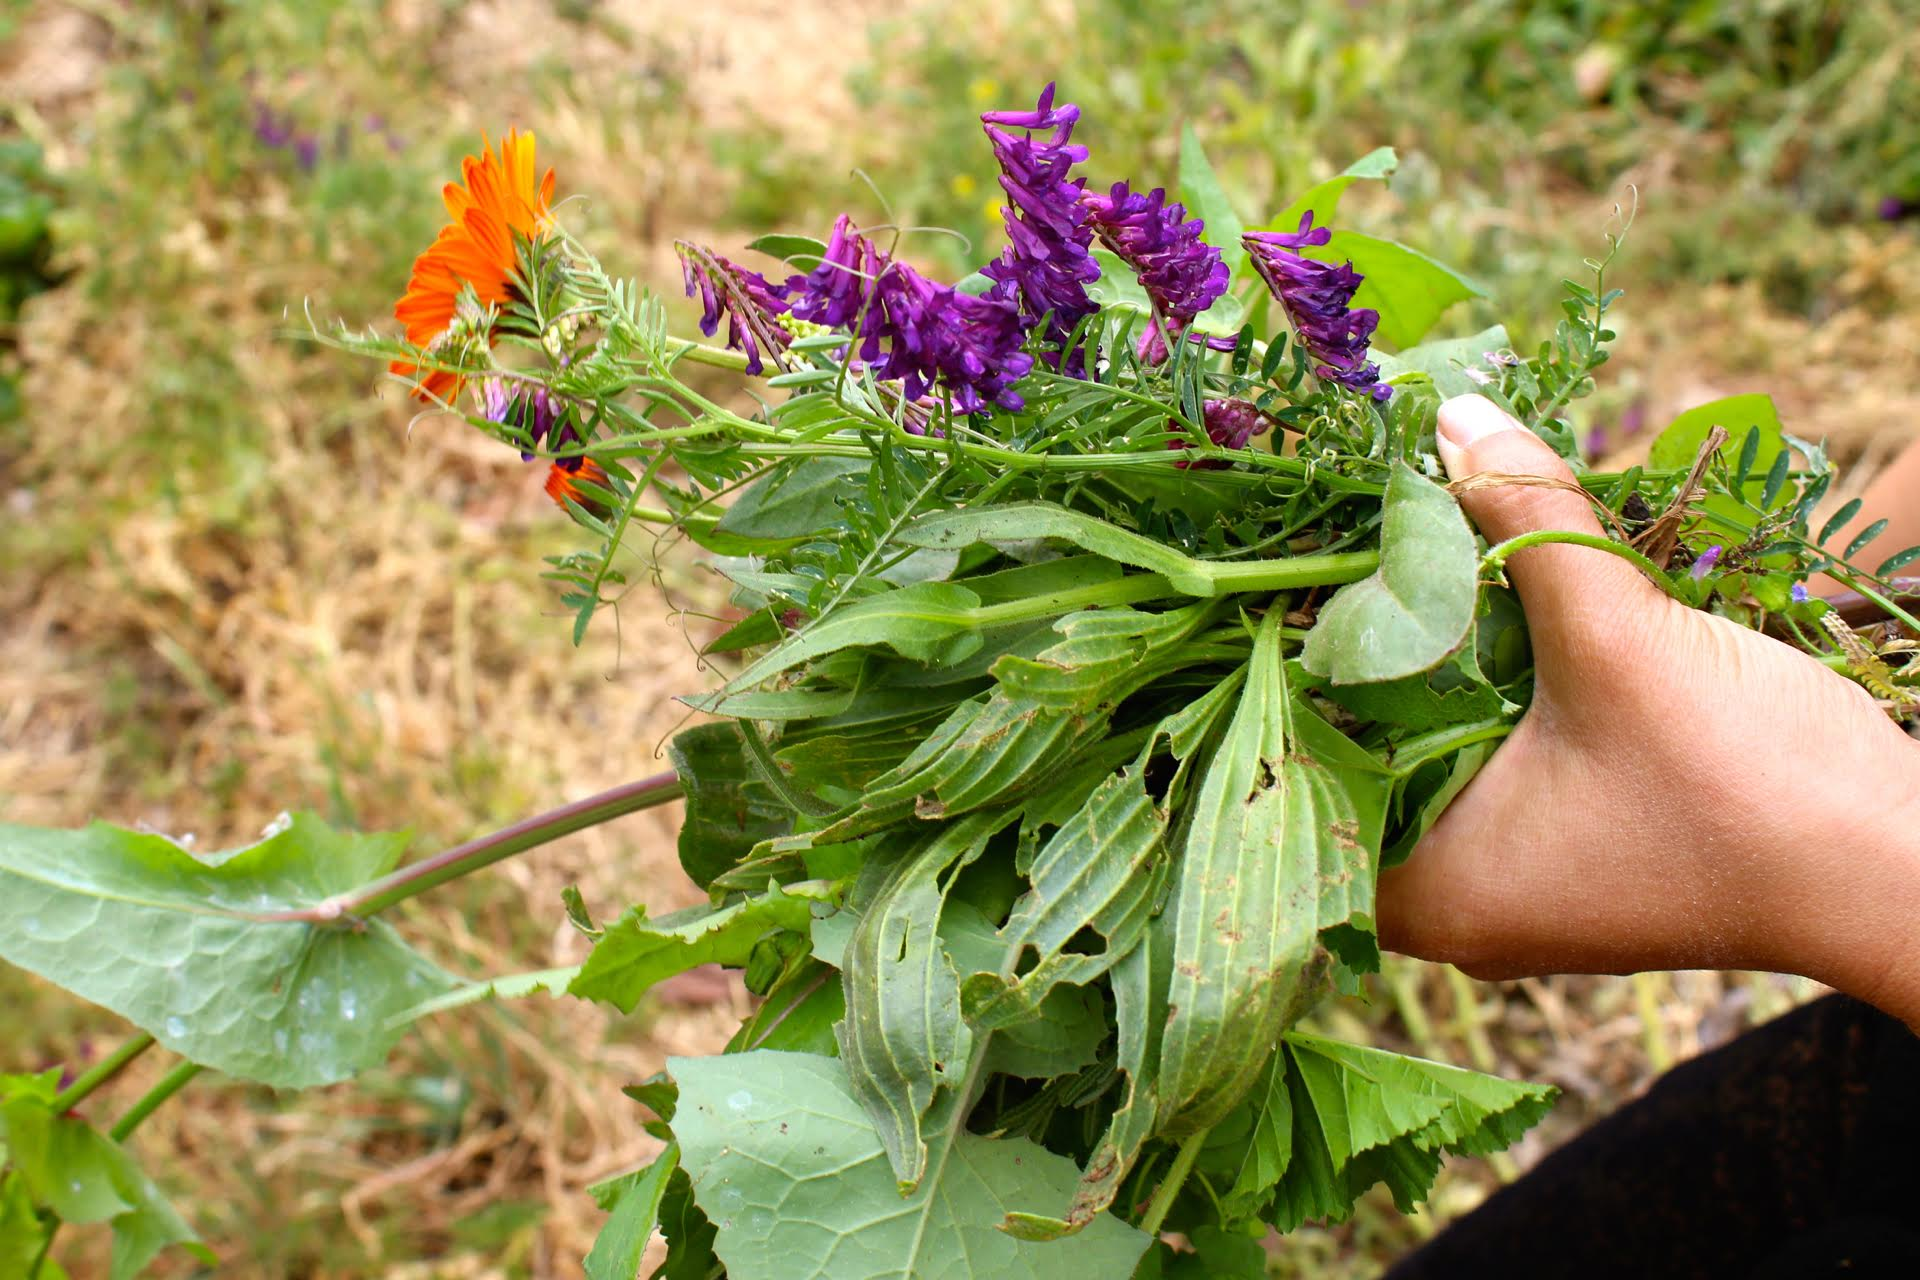 Edible weeds found around Oakland: Calendula, vetch and plantago.